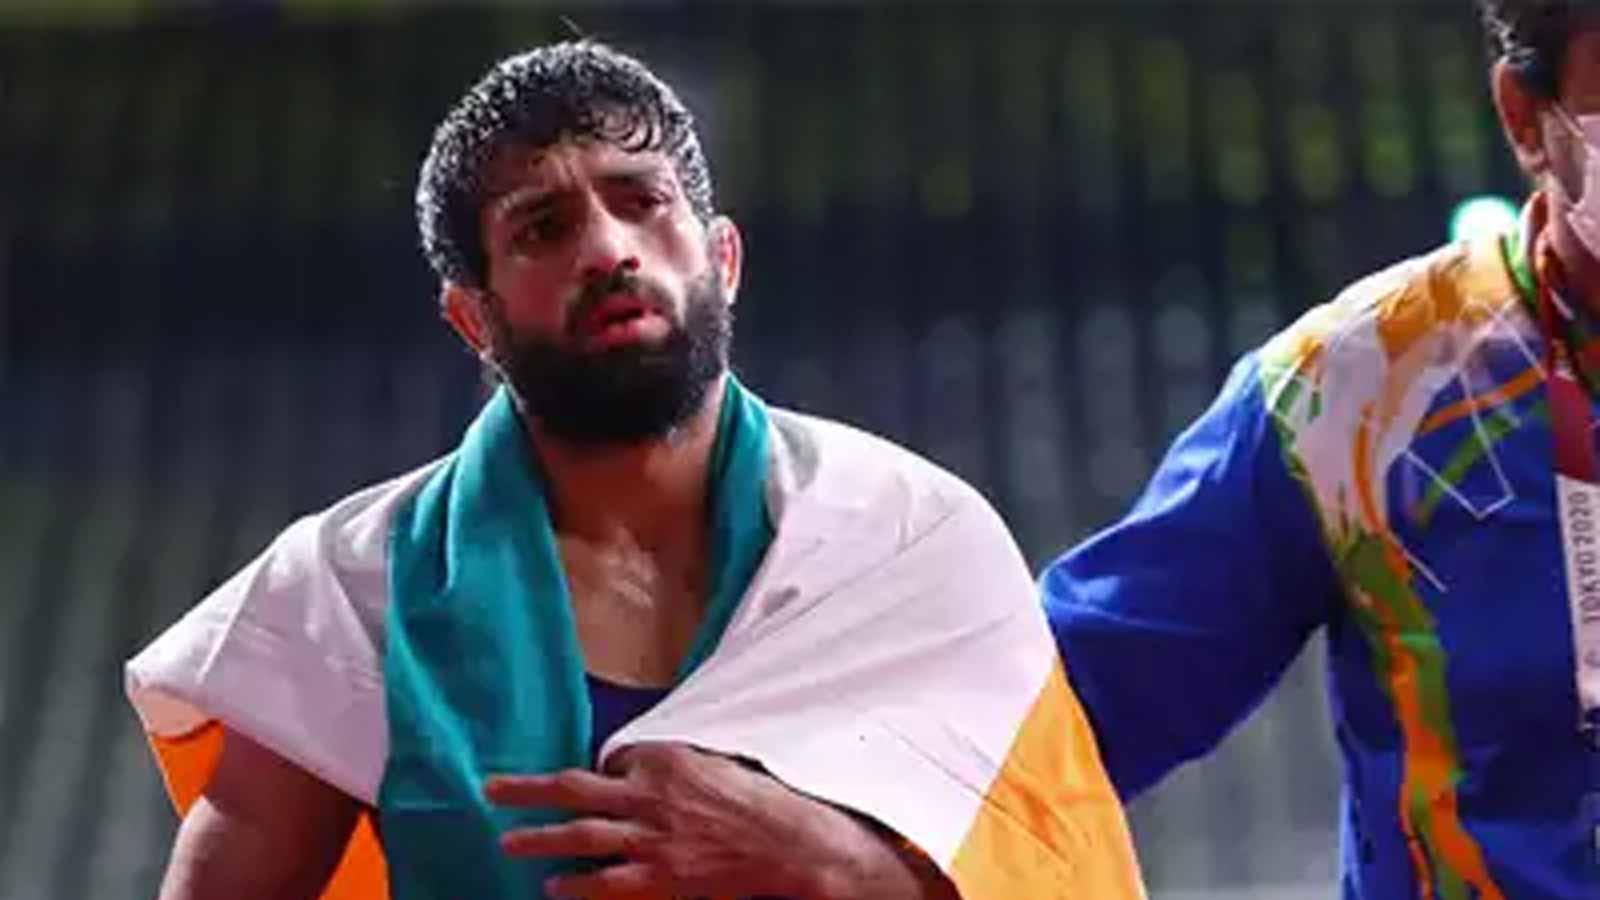 tokyo-olympics-ravi-kumar-dahiya-wins-silver-medal-for-india-in-mens-57kg-freestyle-wrestling